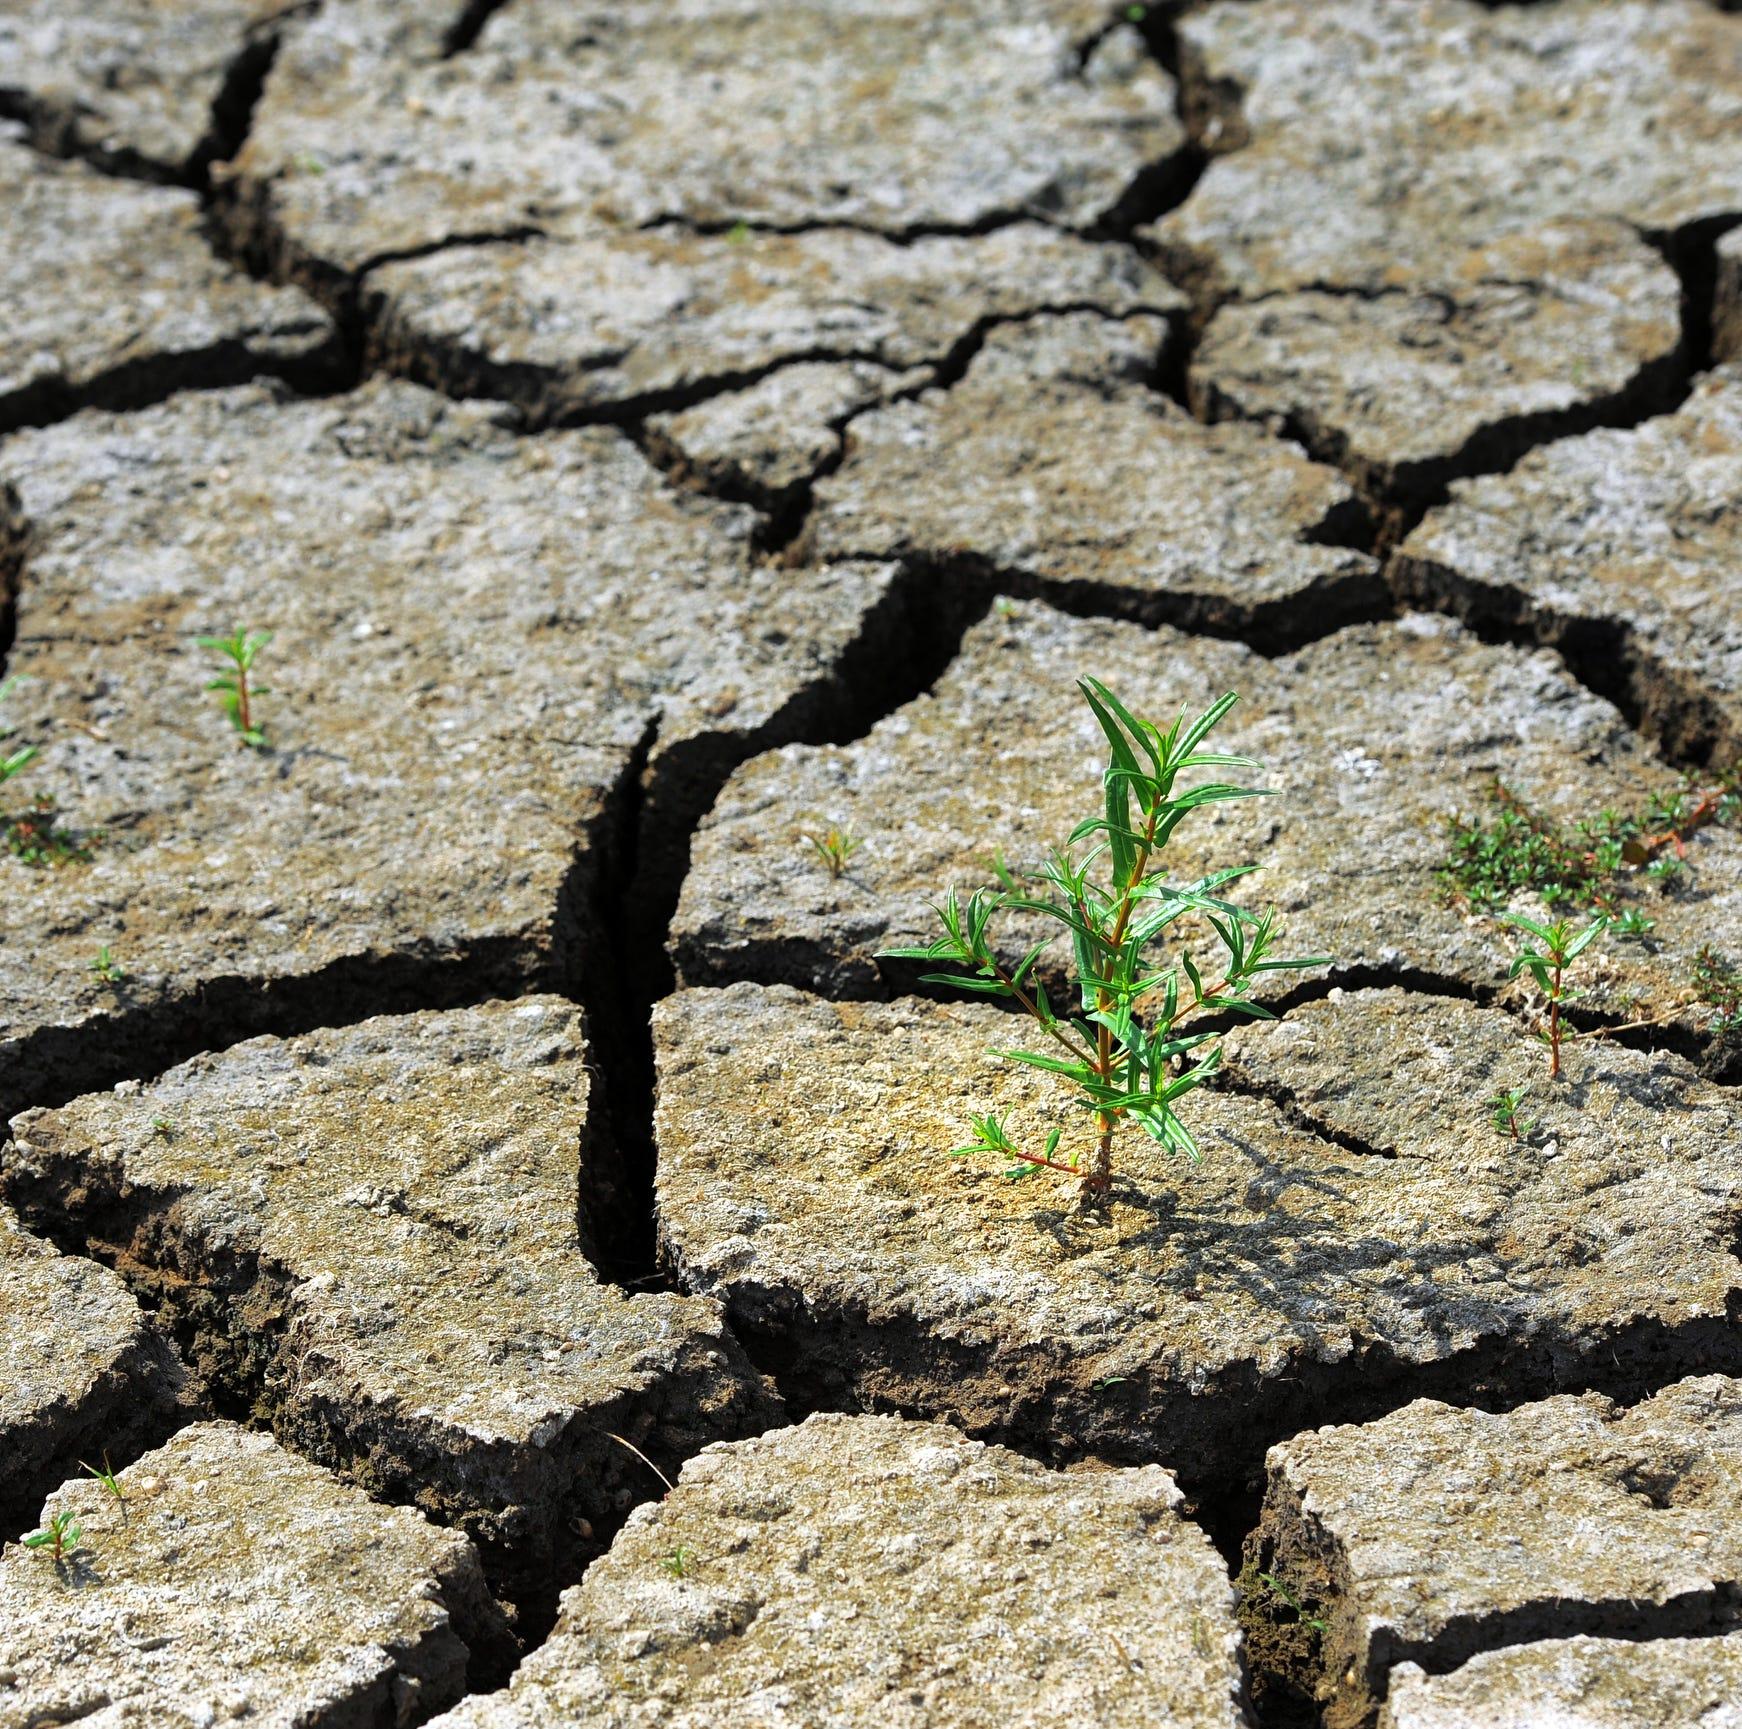 Bruce Kreitler: Take care when killing weeds